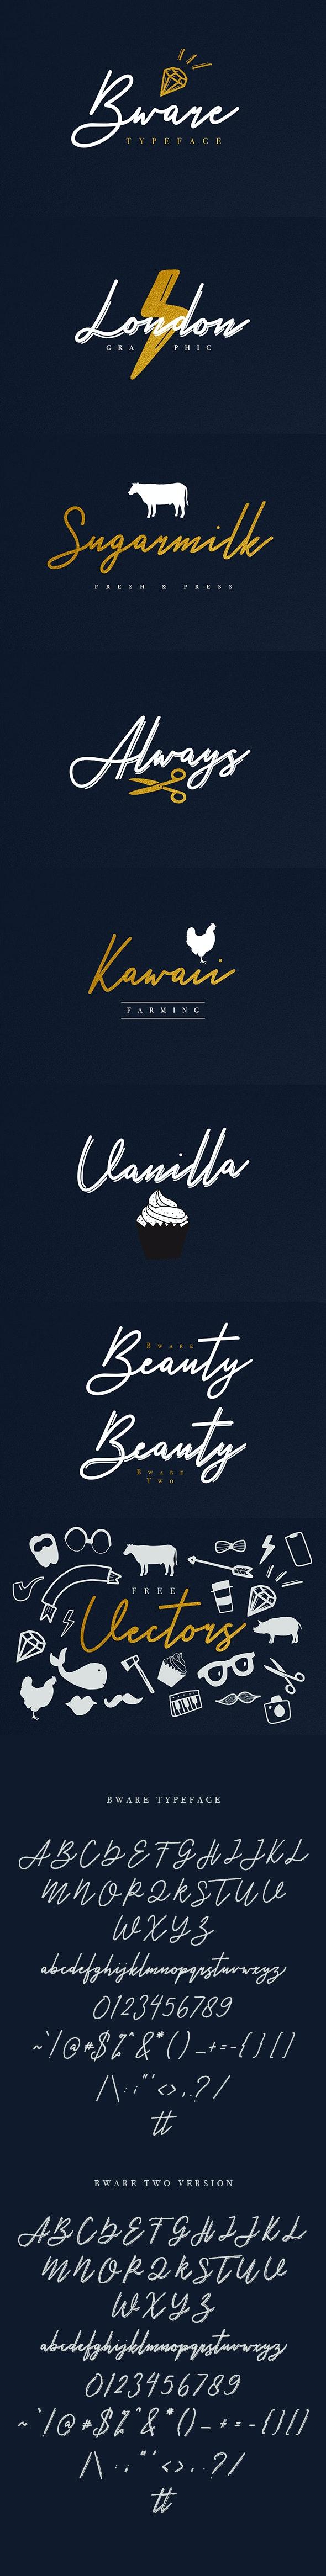 Bware Typeface - Calligraphy Script